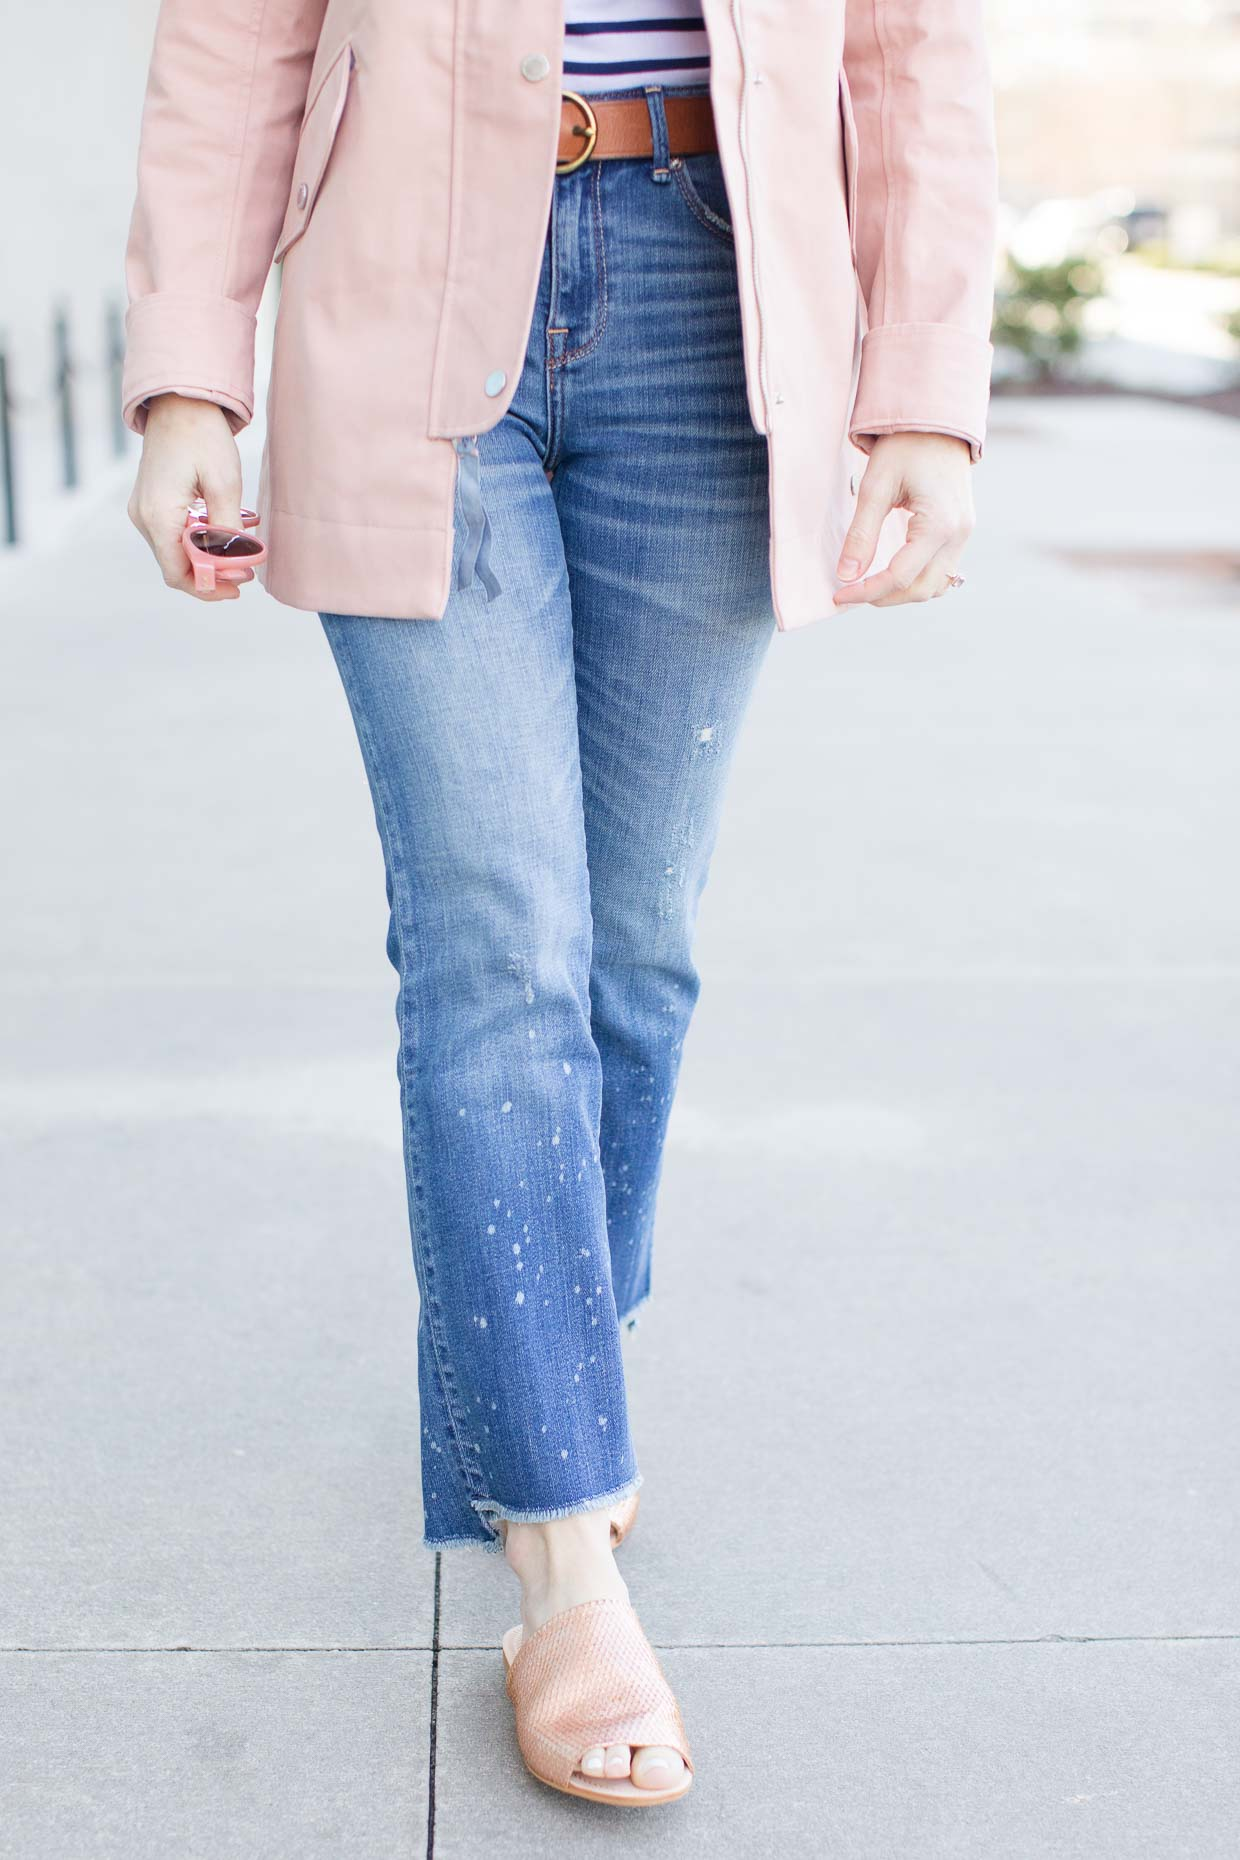 Abercrombie Pink Classic Raincoat - Poor Little It Girl